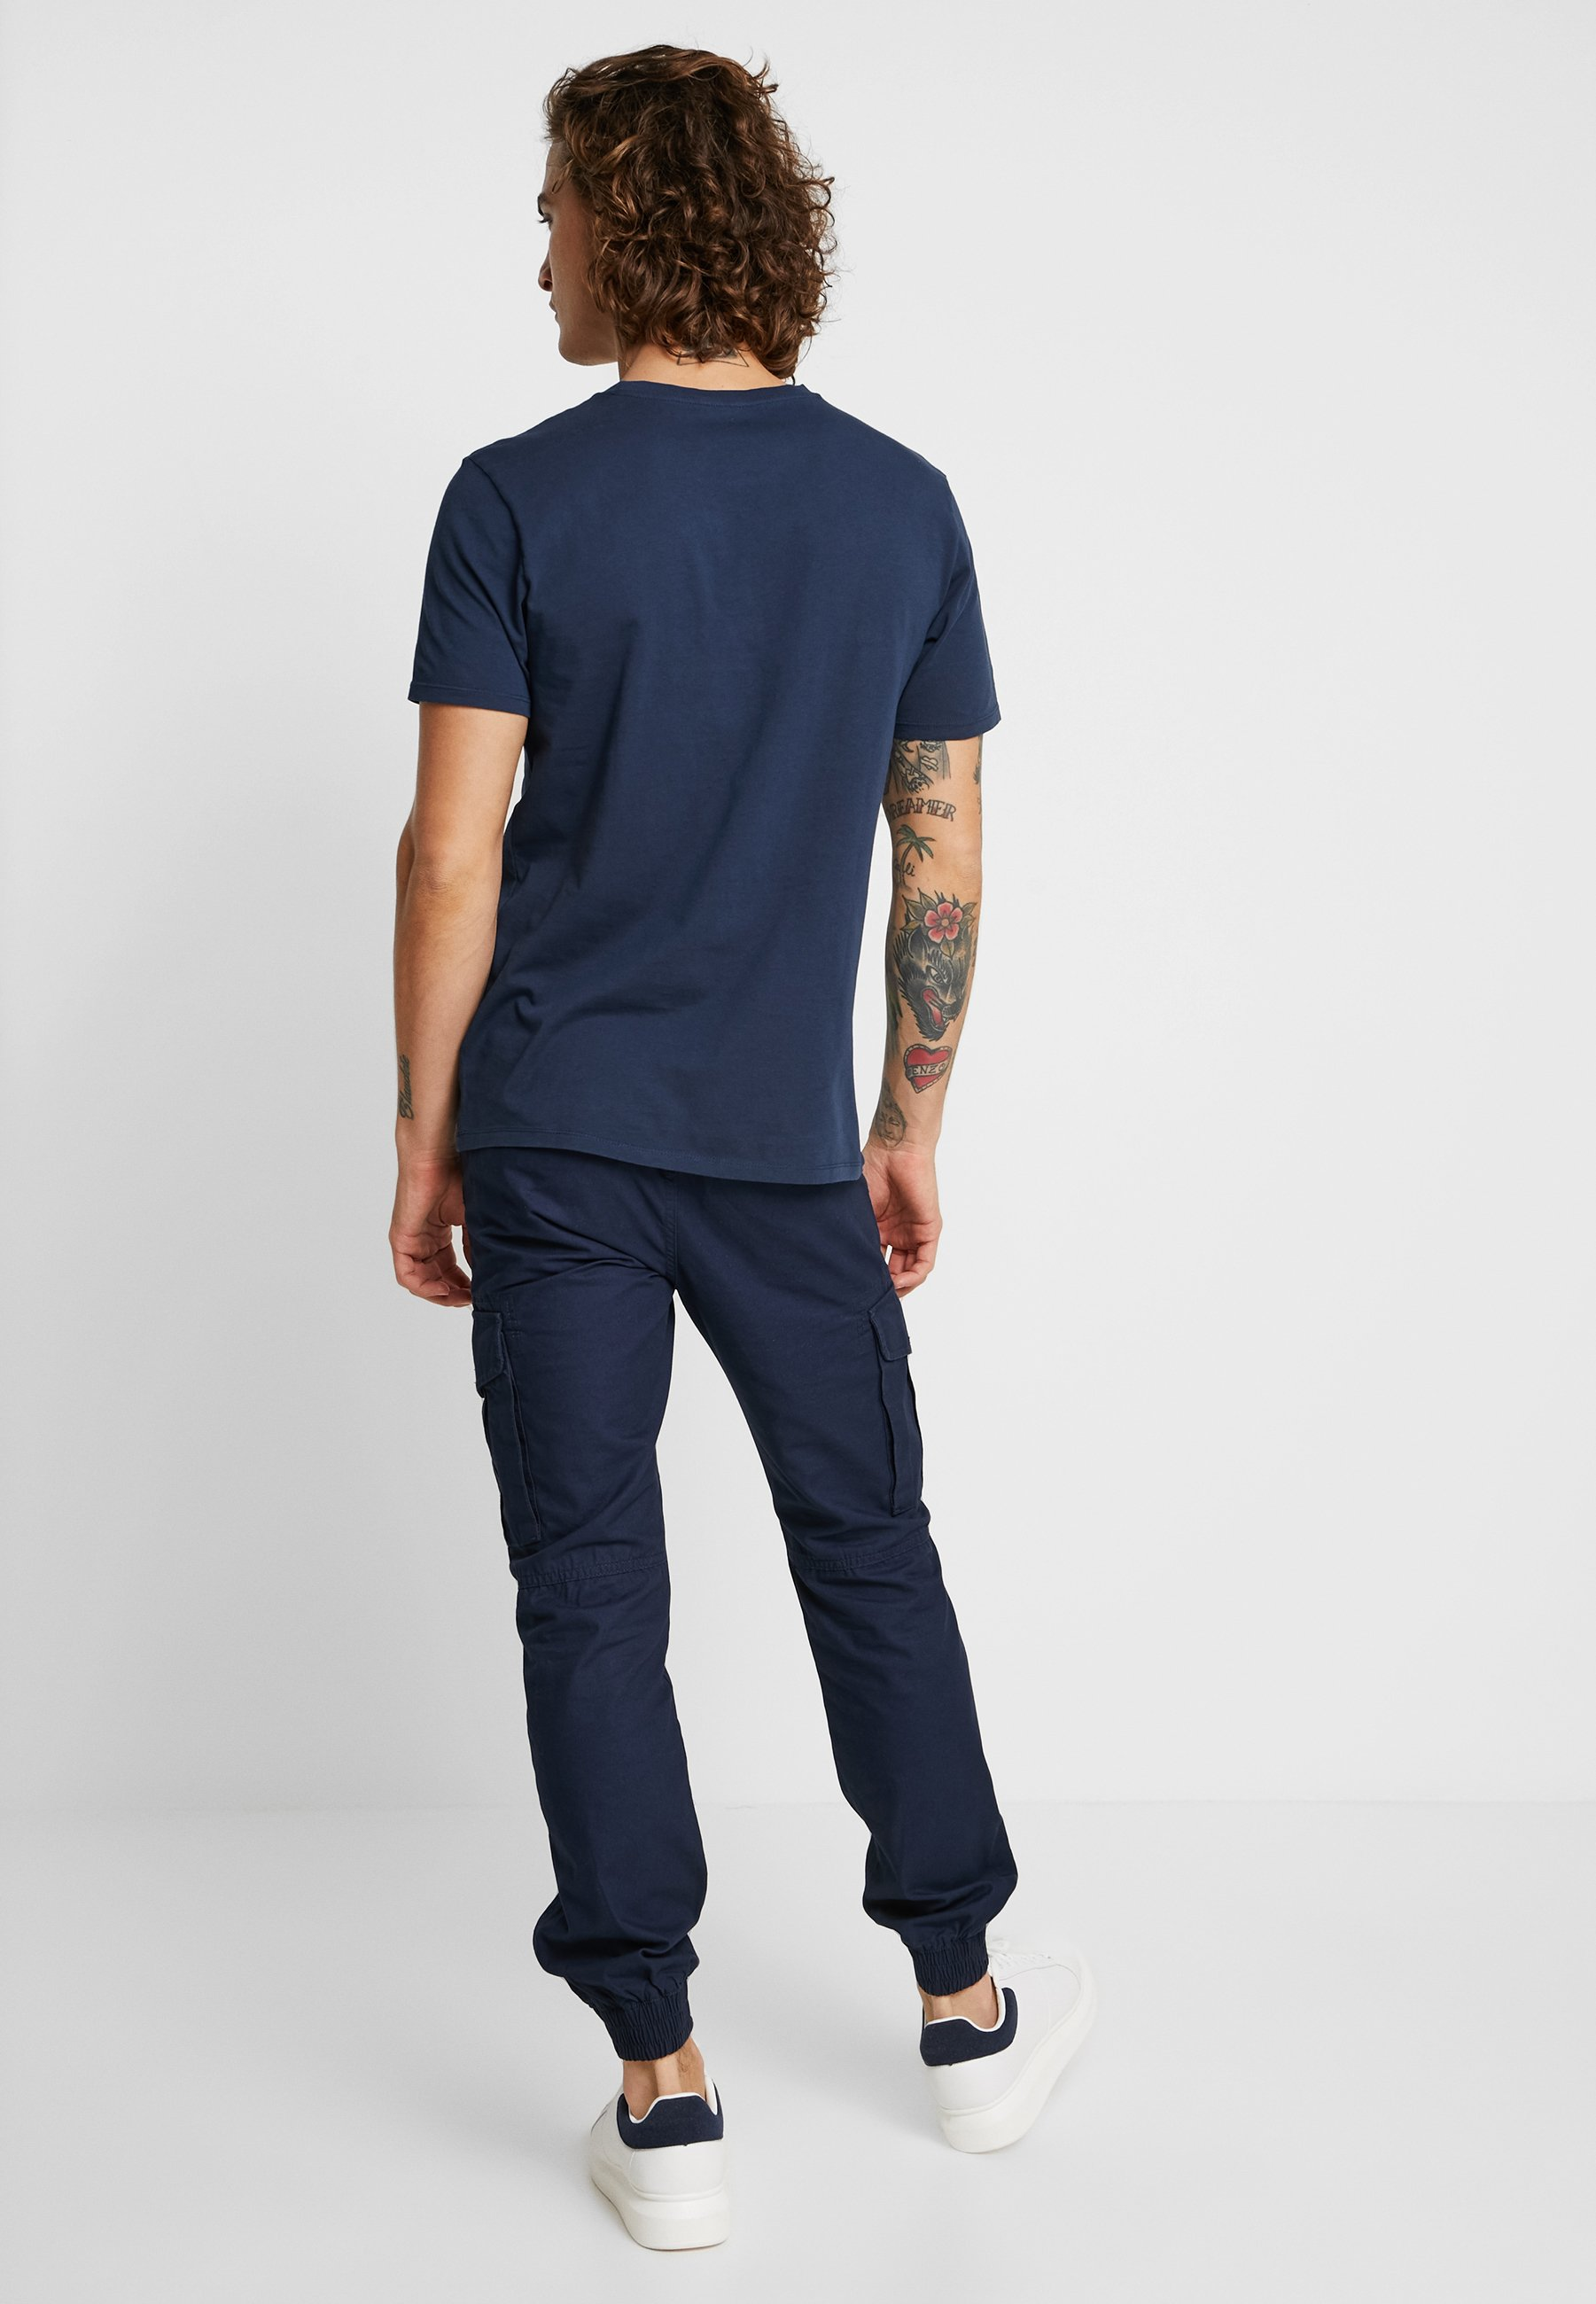 TeeT Navy Lee shirt Drop Logo Imprimé l3FJKcT1